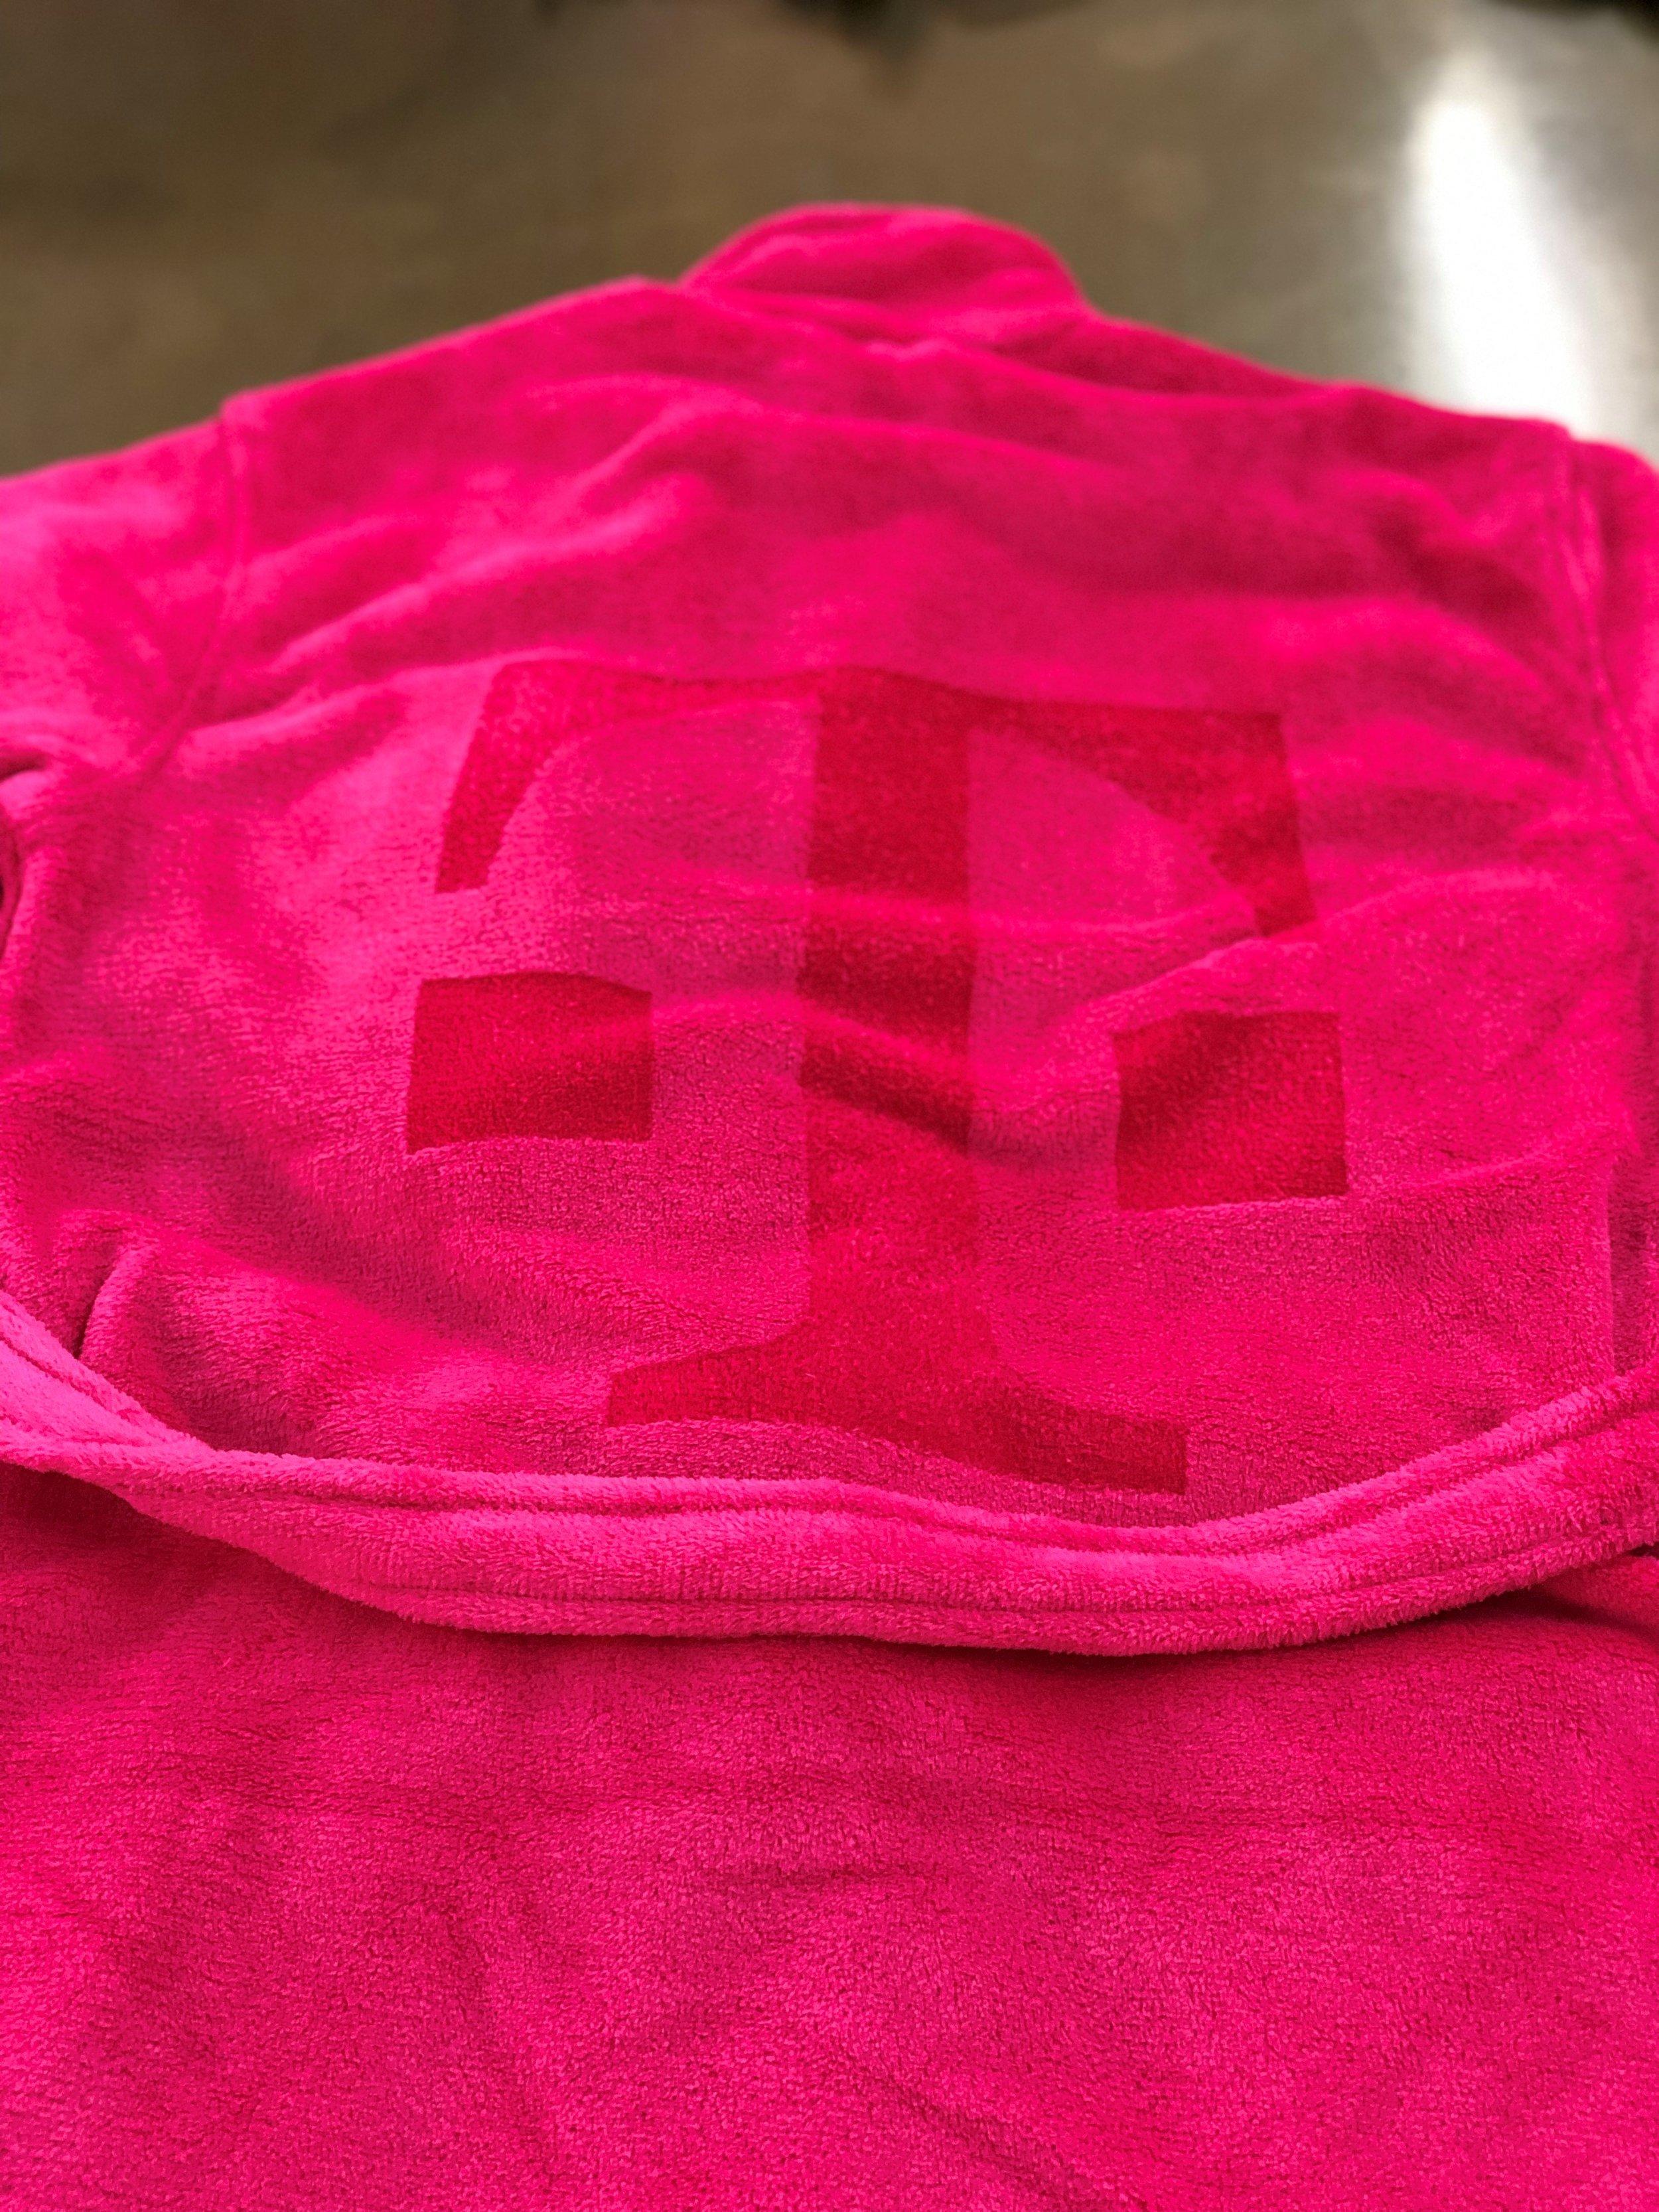 logounltd_laser_embroidery_screen_printing_apparel_uniform_custom_tshirts_kirkland_bellevue_seattle_redmond_branded_merchandise_promotional_products_logo_unltd_t_mobile_Tuesday_tmobile_un_carrier_magenta_5G_john_lege (11).jpg